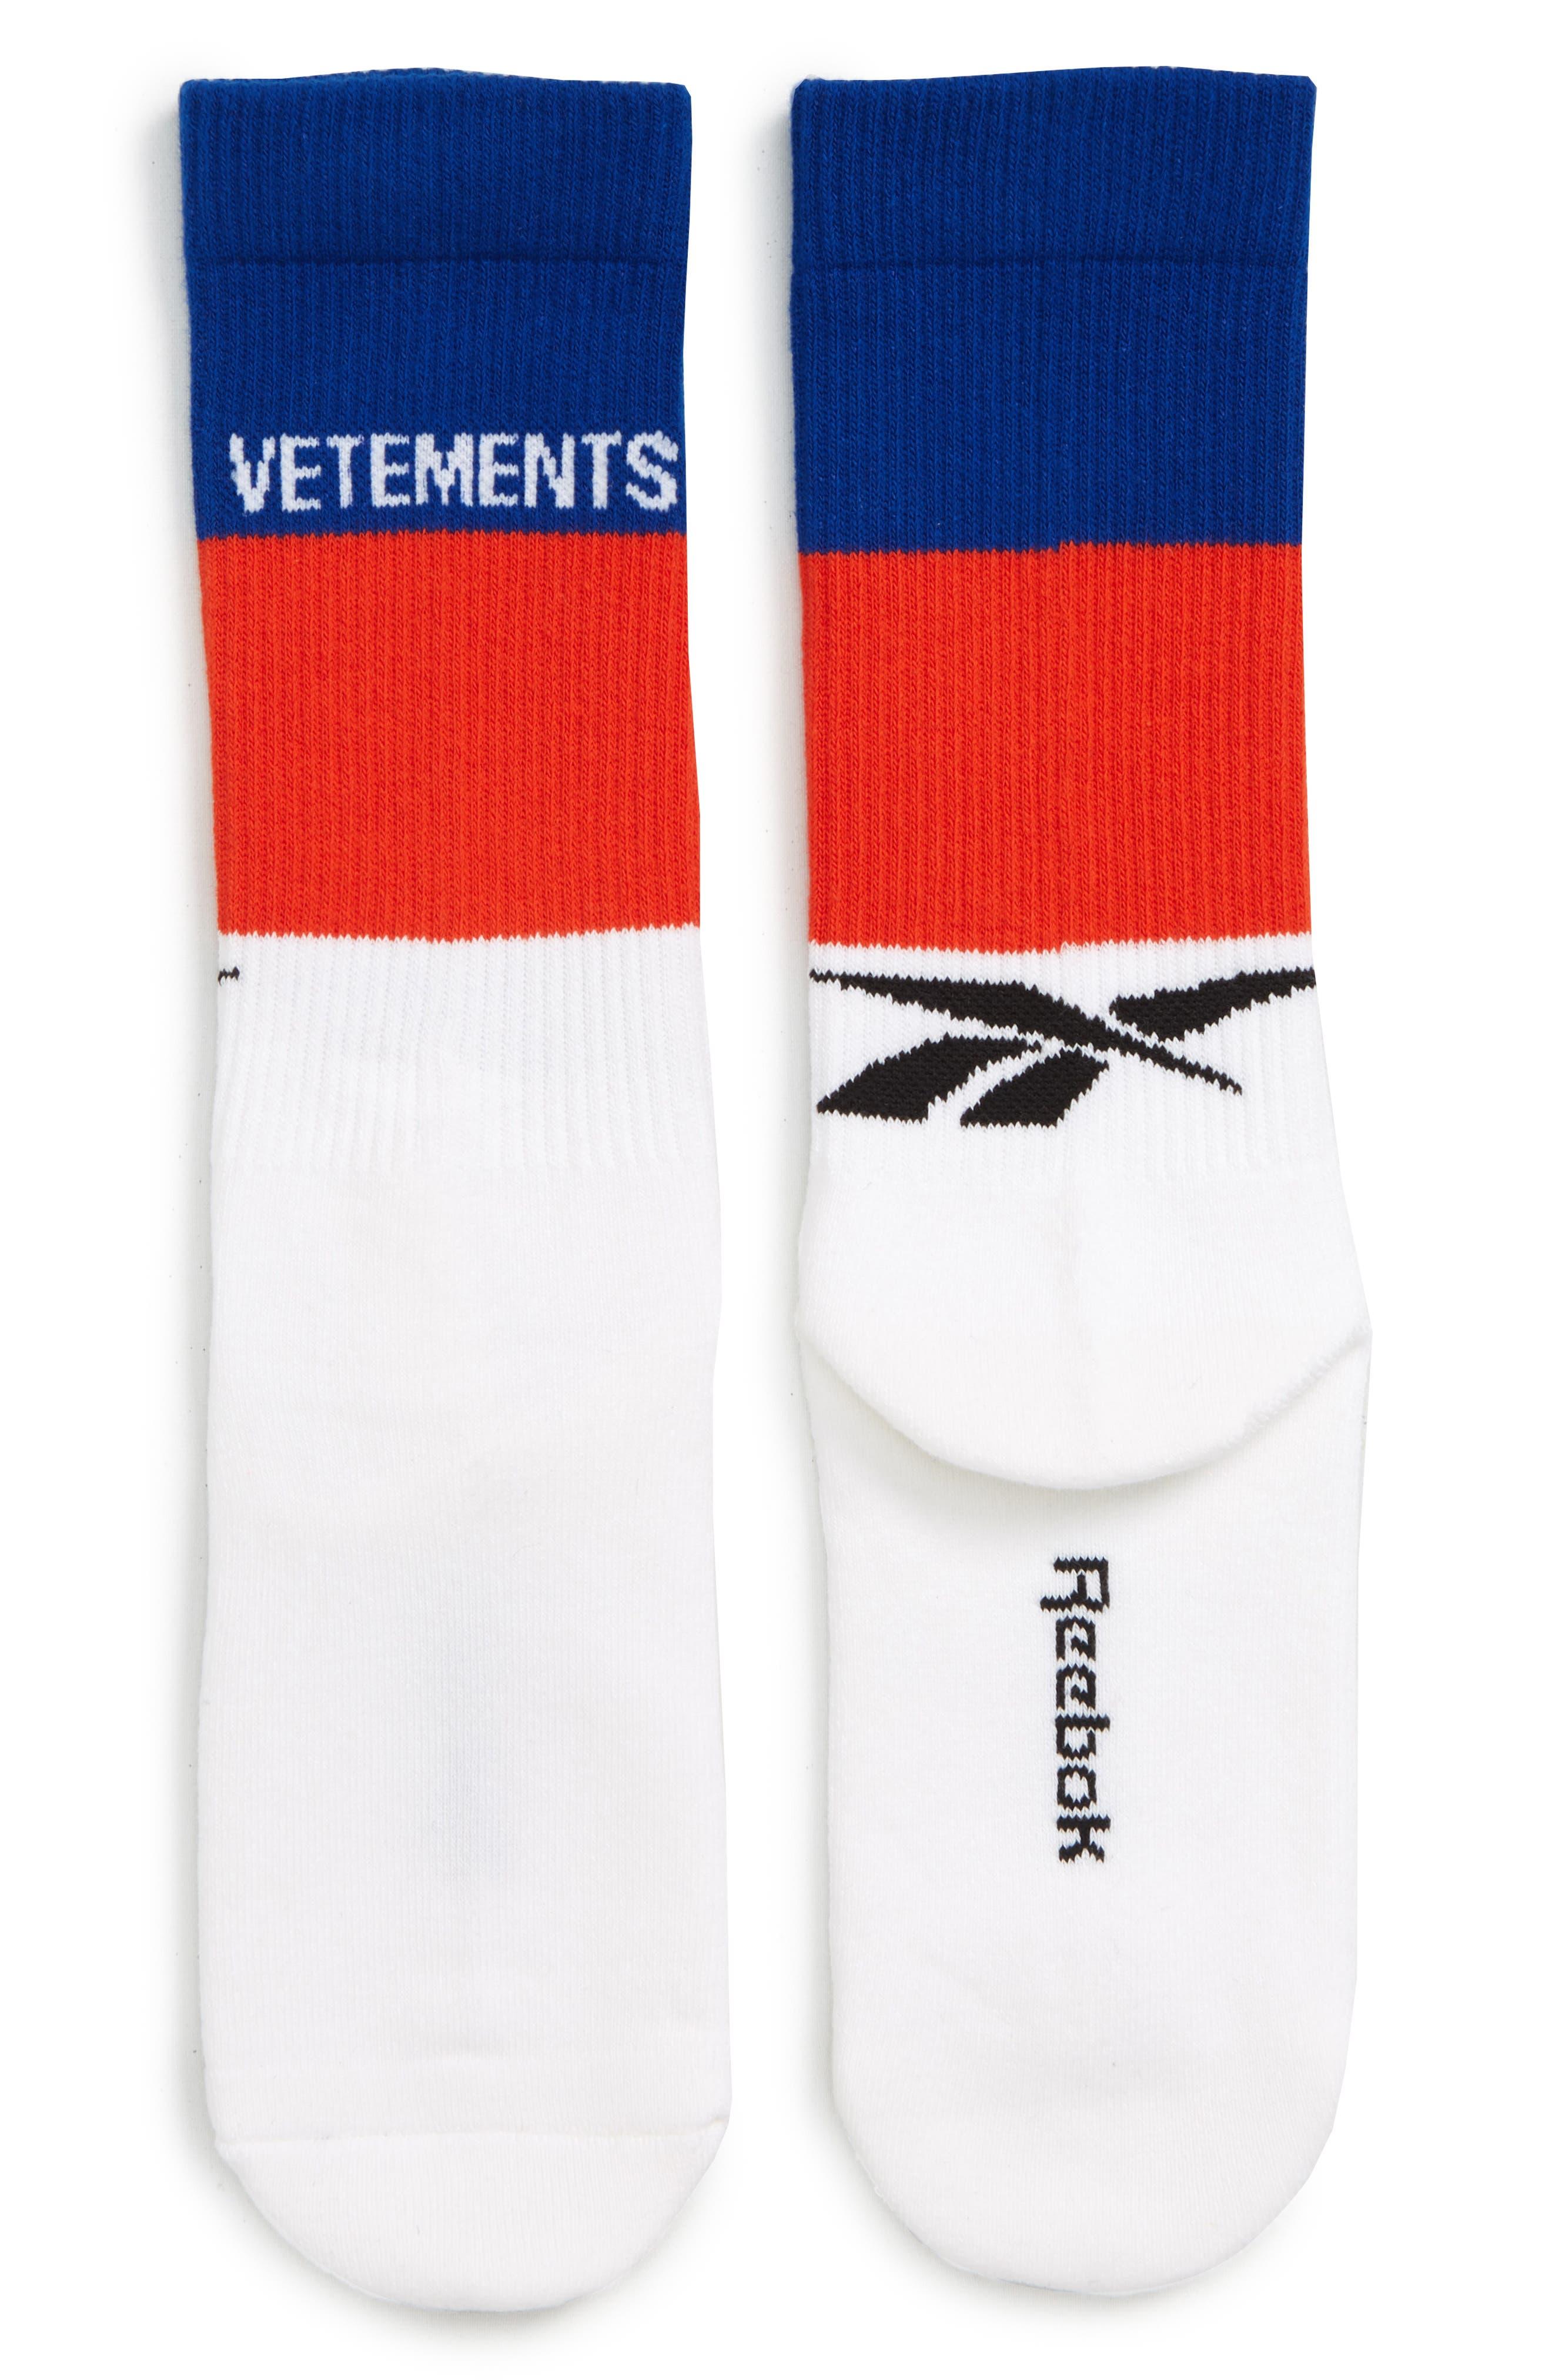 VETEMENTS, Stripe Socks, Main thumbnail 1, color, BLUE/ WHITE/ RED